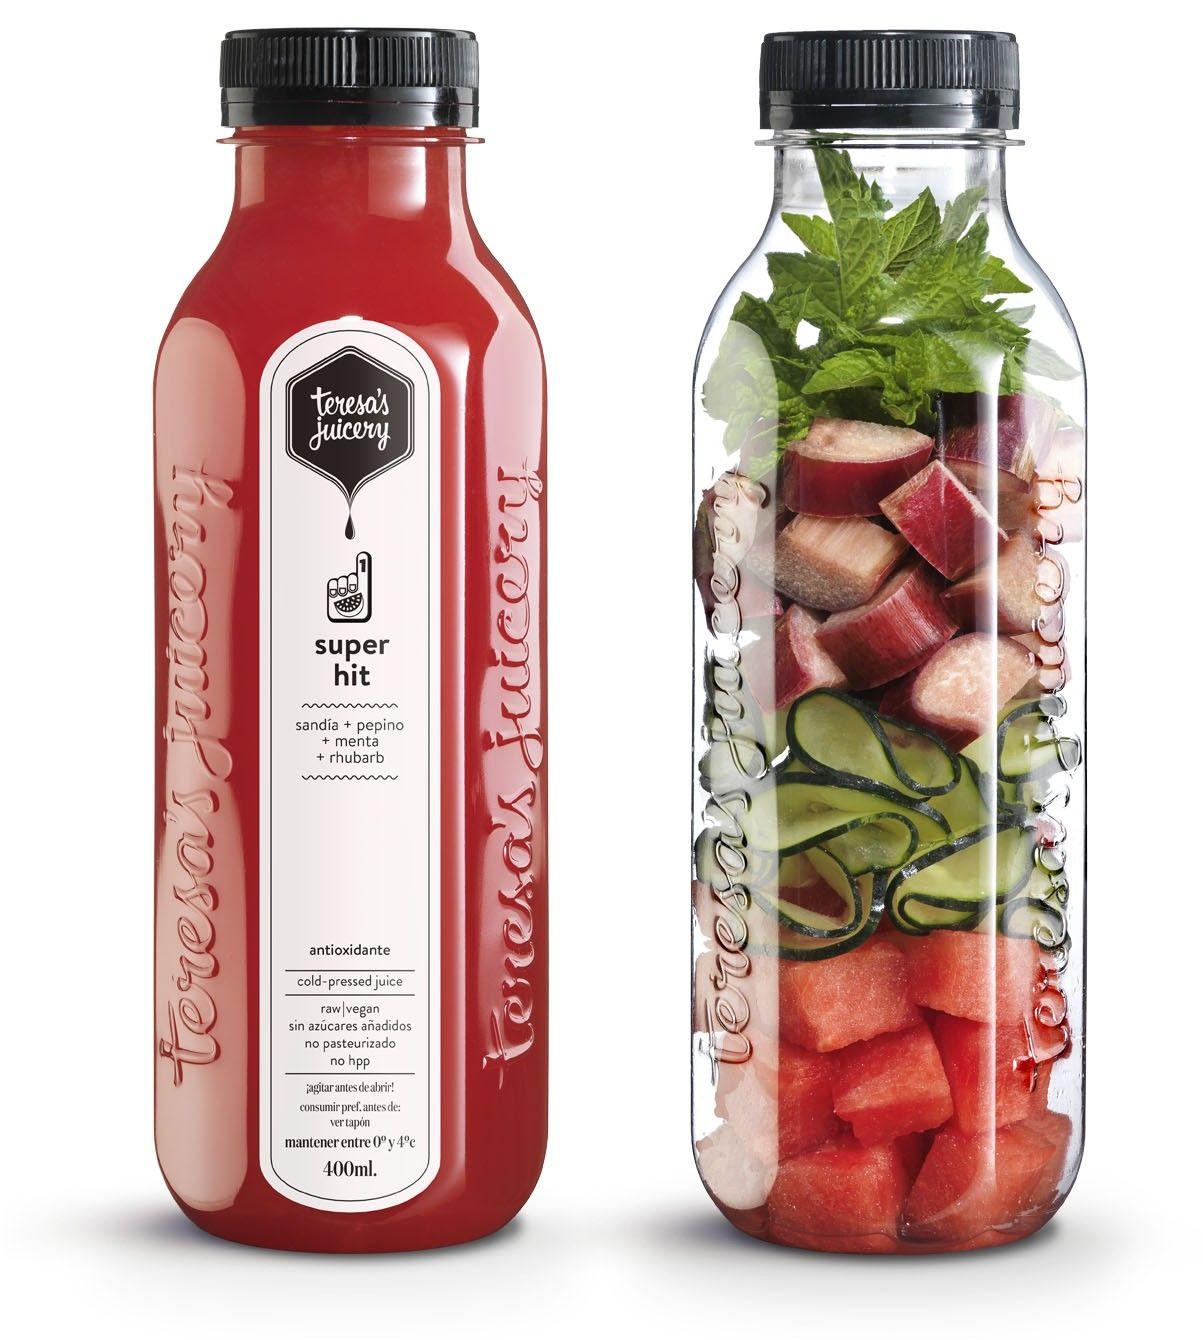 Super Hit Healthy Juices Healthy Drinks Juicing Recipes